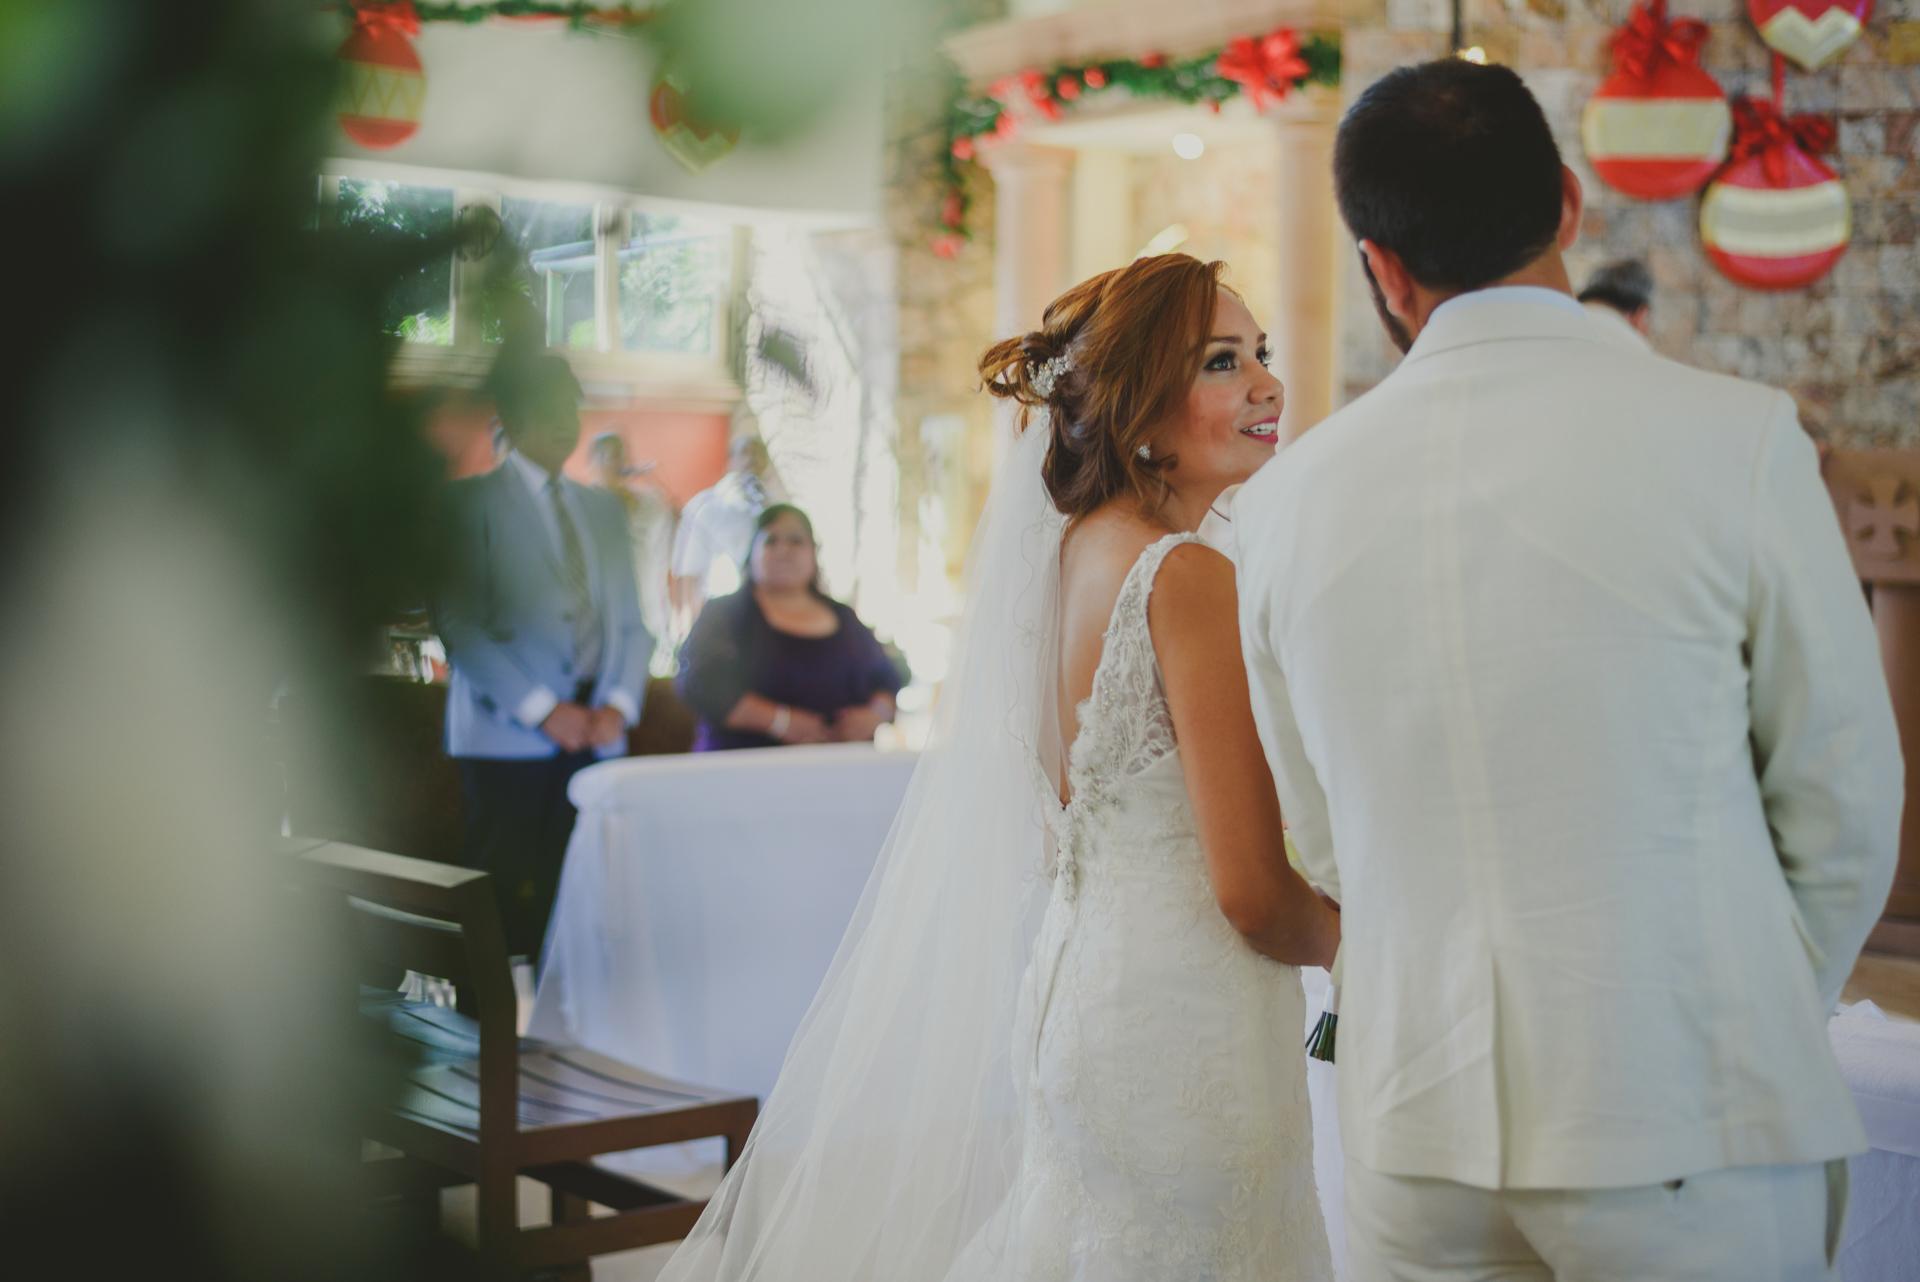 Wedding N&M BLOG luishoudin.com (36 de 174)